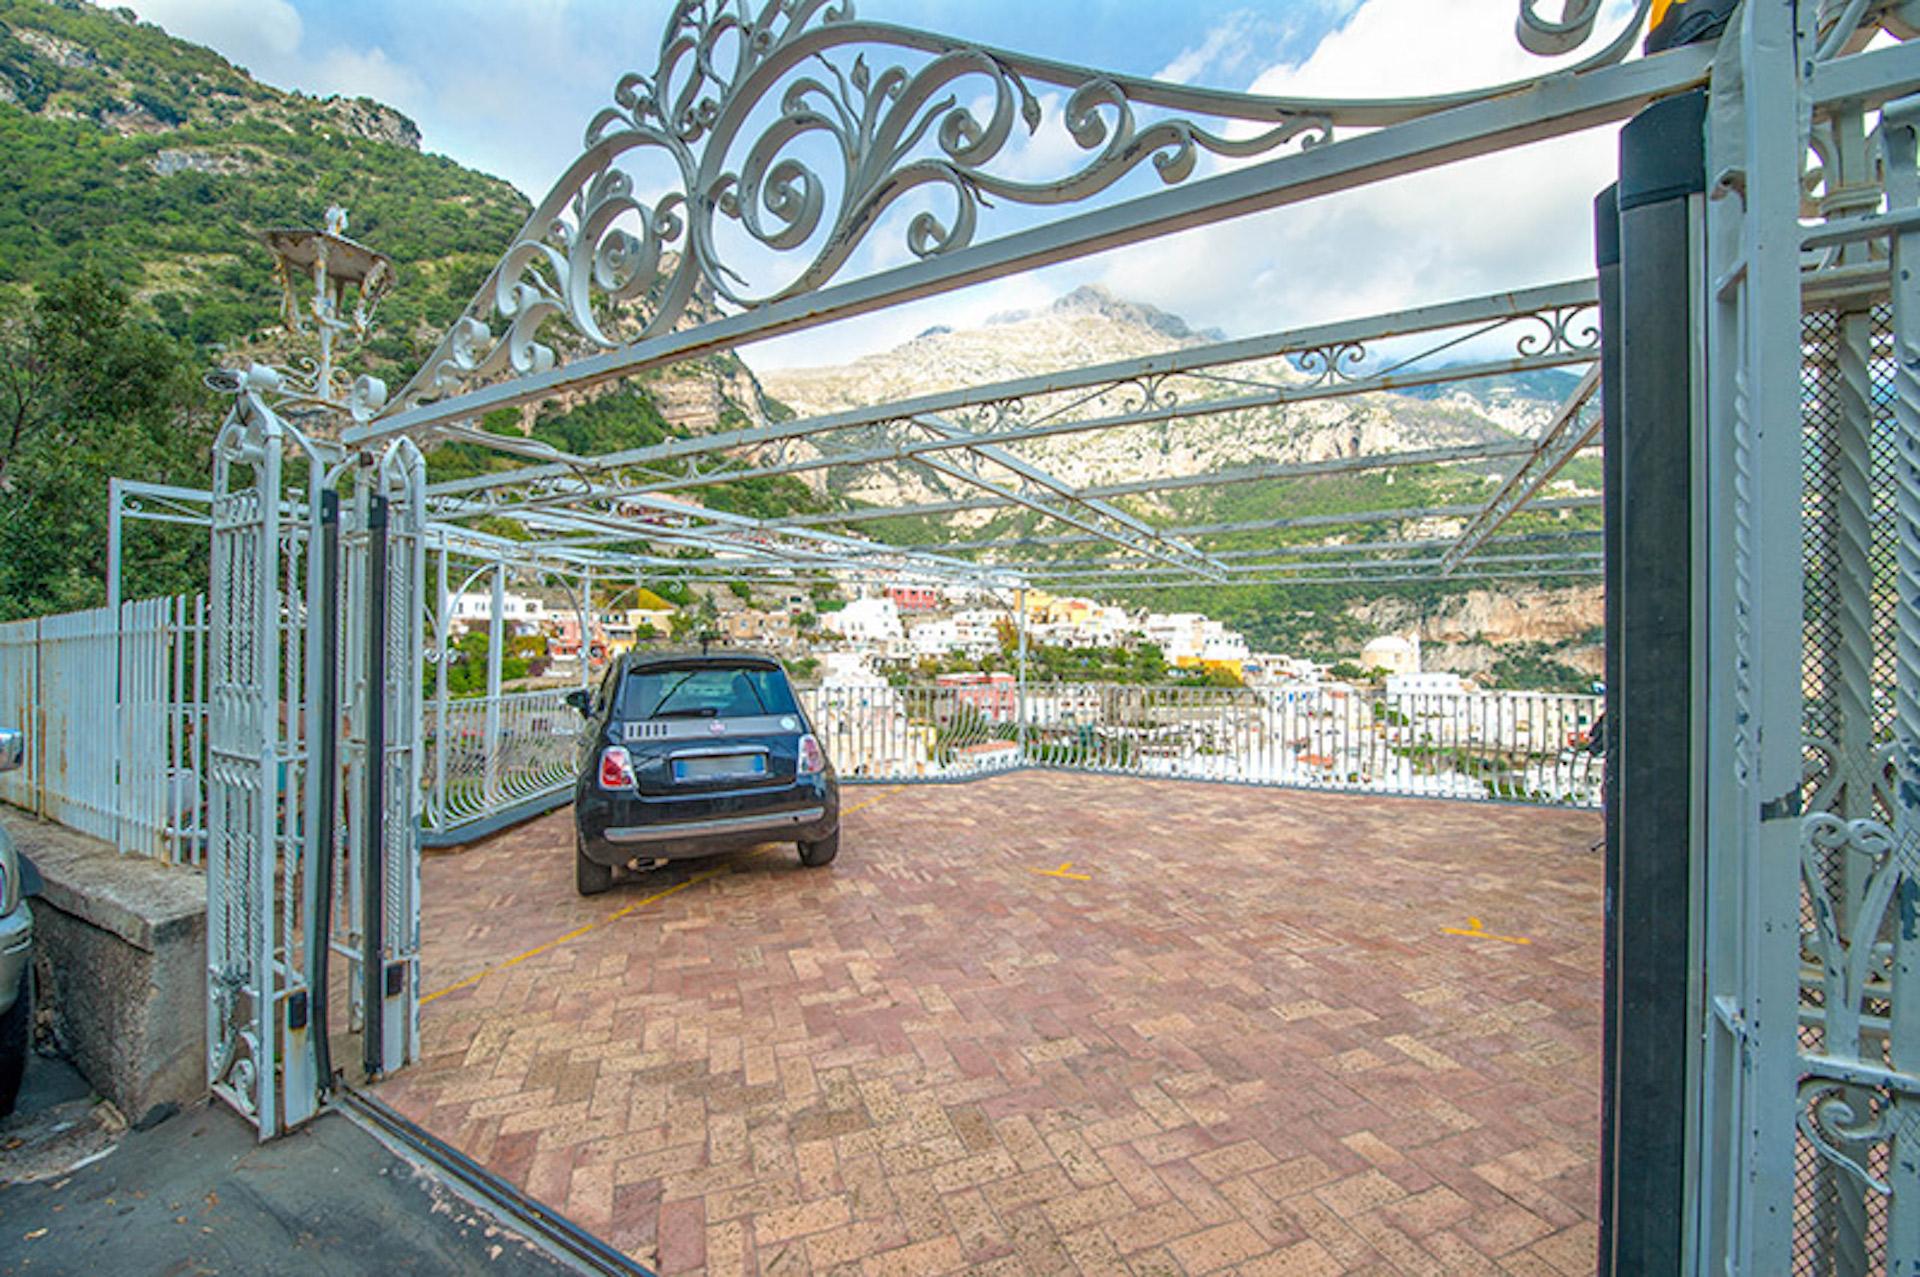 Positano Positano Amalfi Coast Villa Capodimonte Gallery 036 1581939642